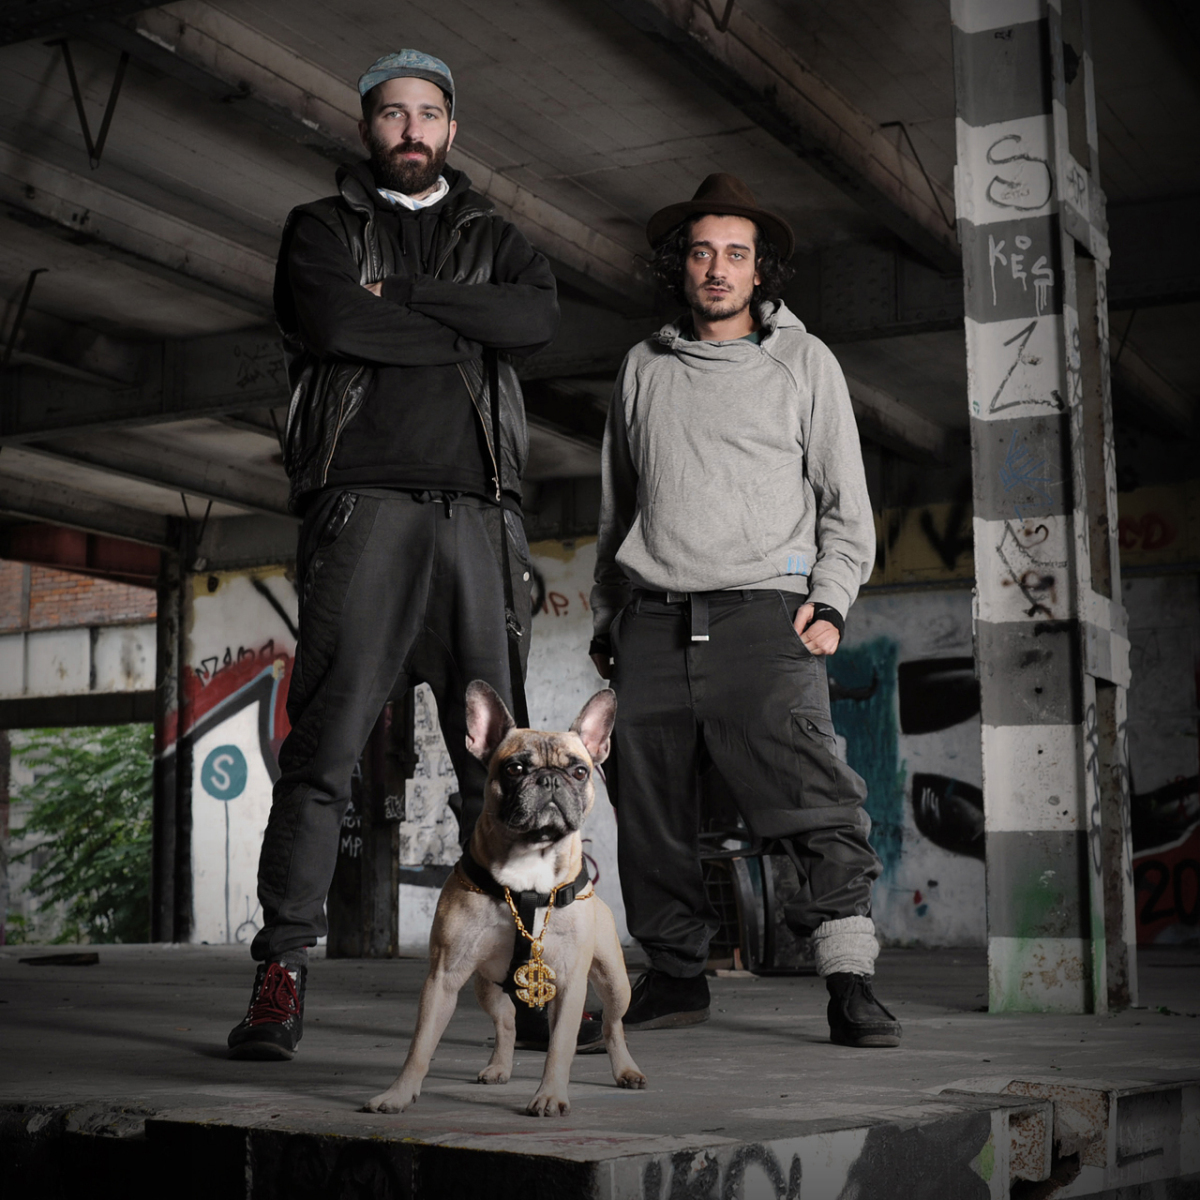 Mundart Hip Hop aus Bayern